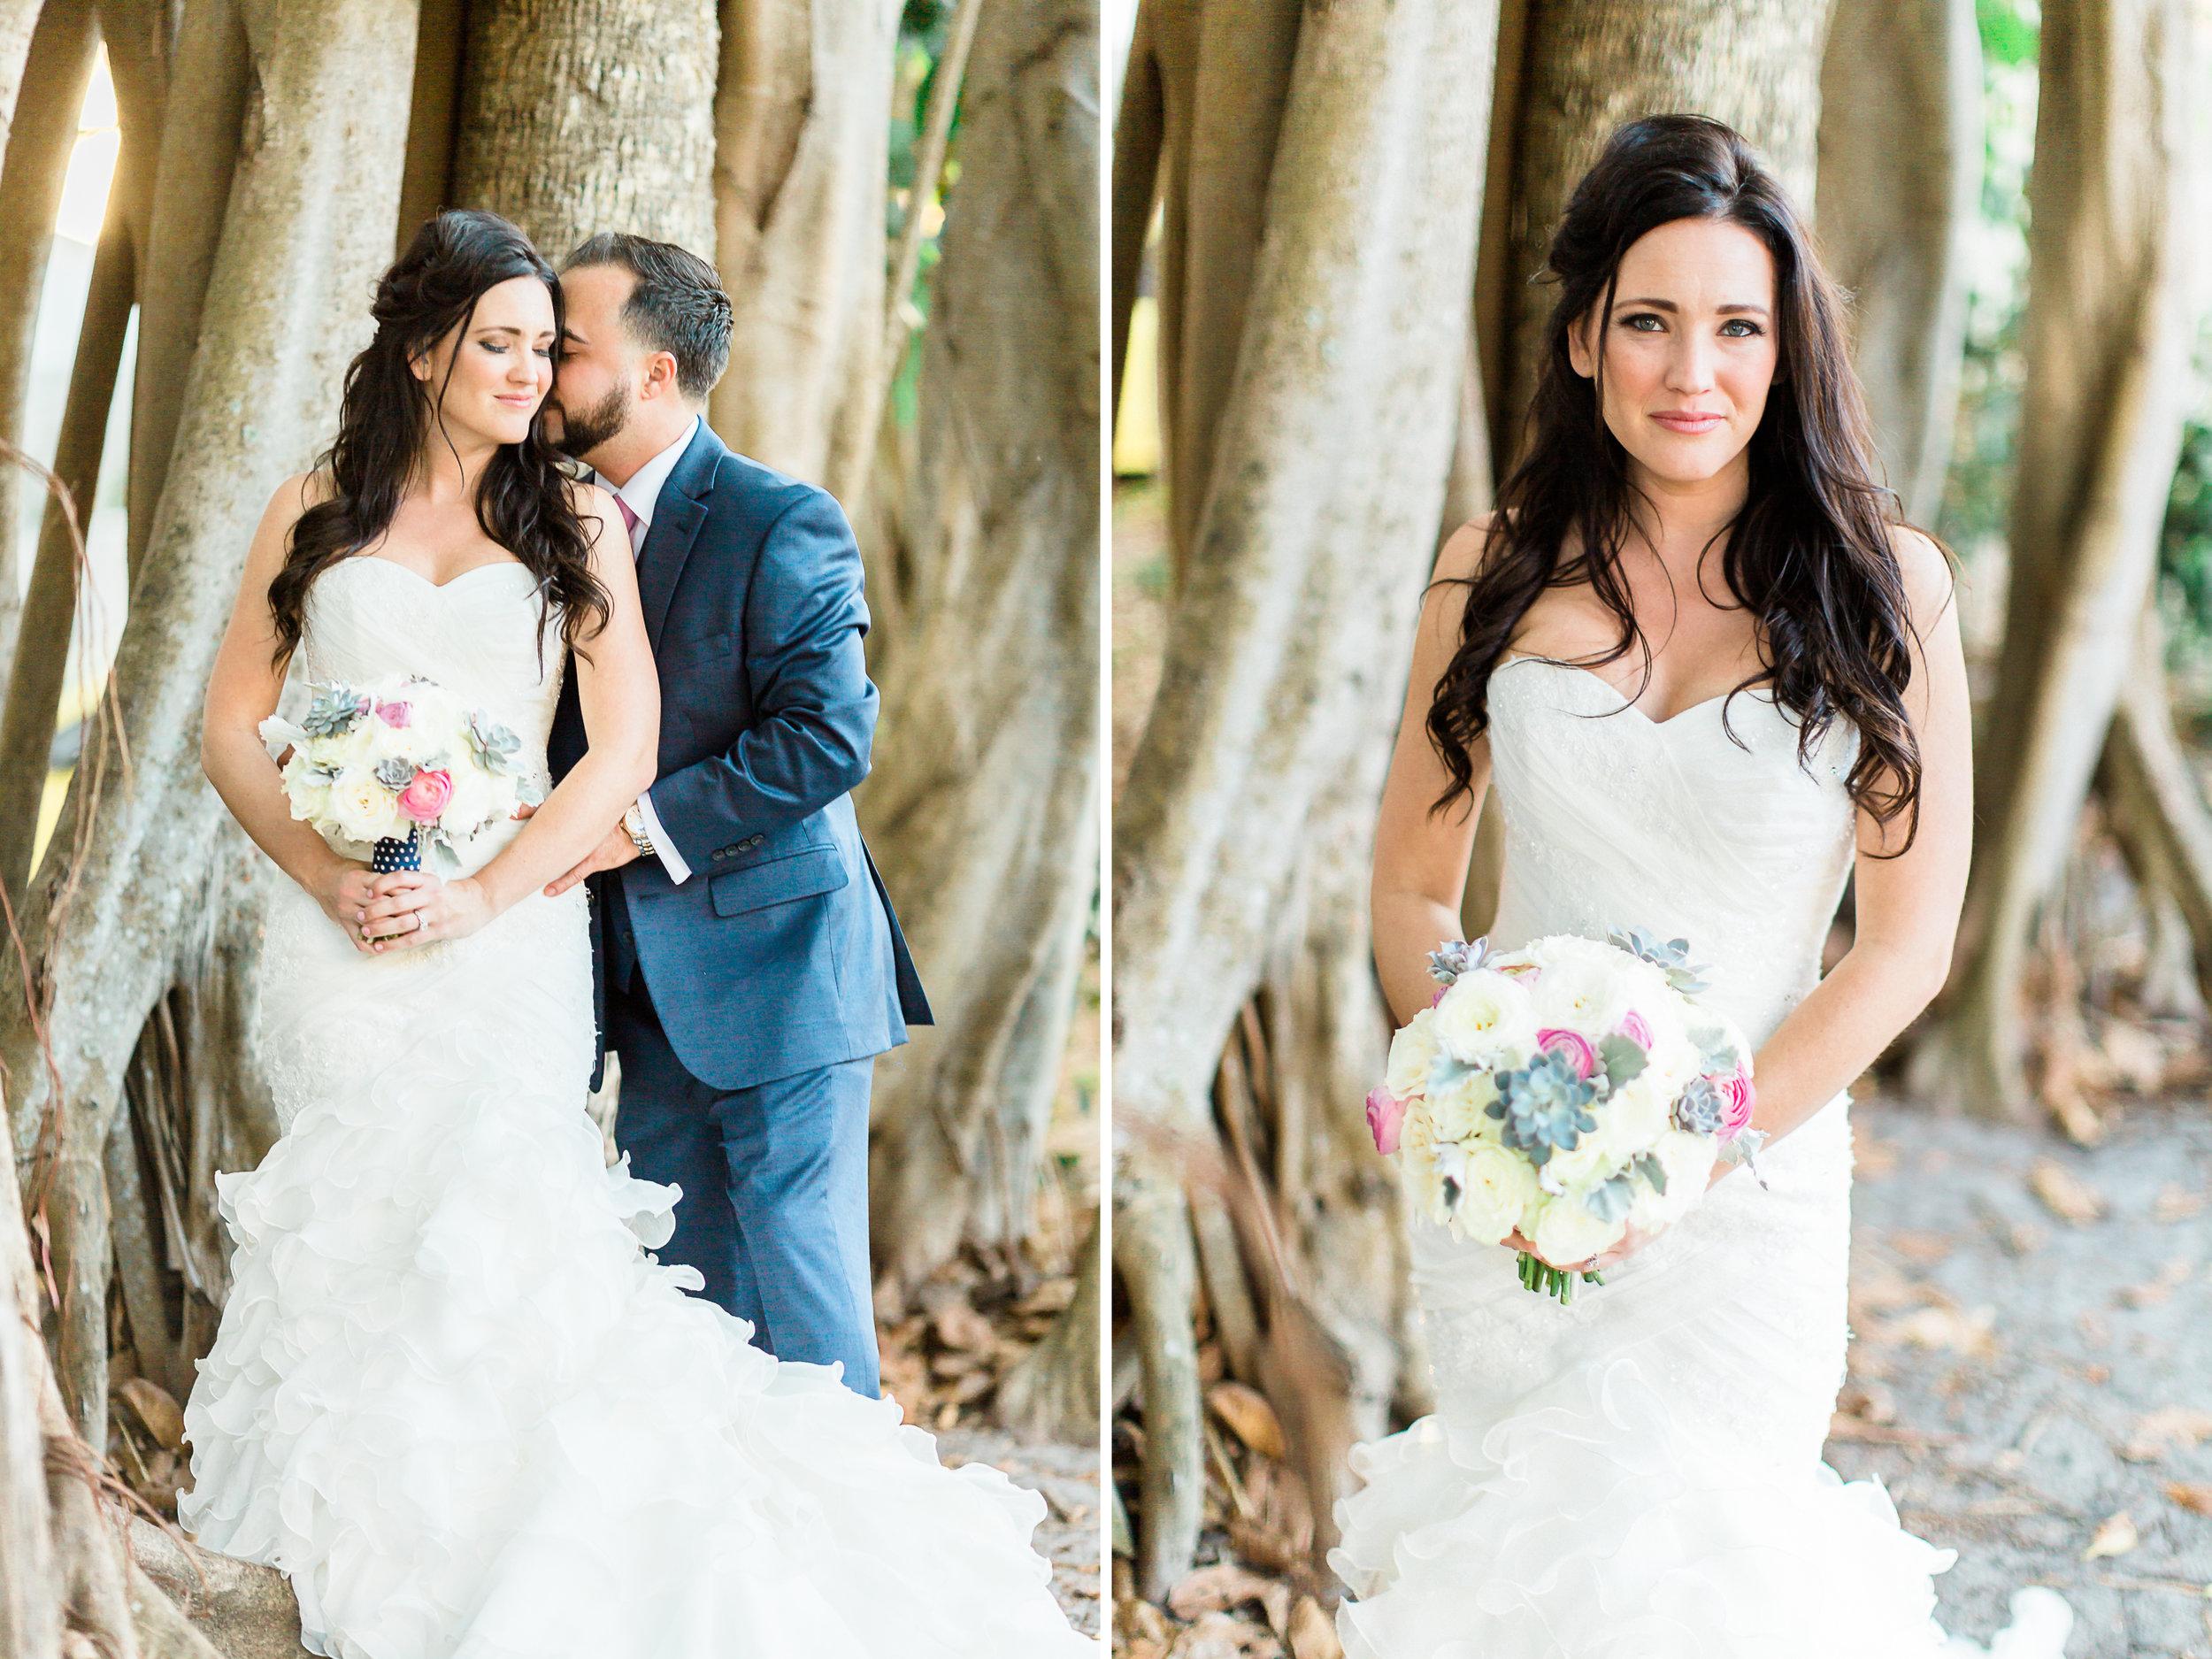 New Smyrn Beach Bride.jpg